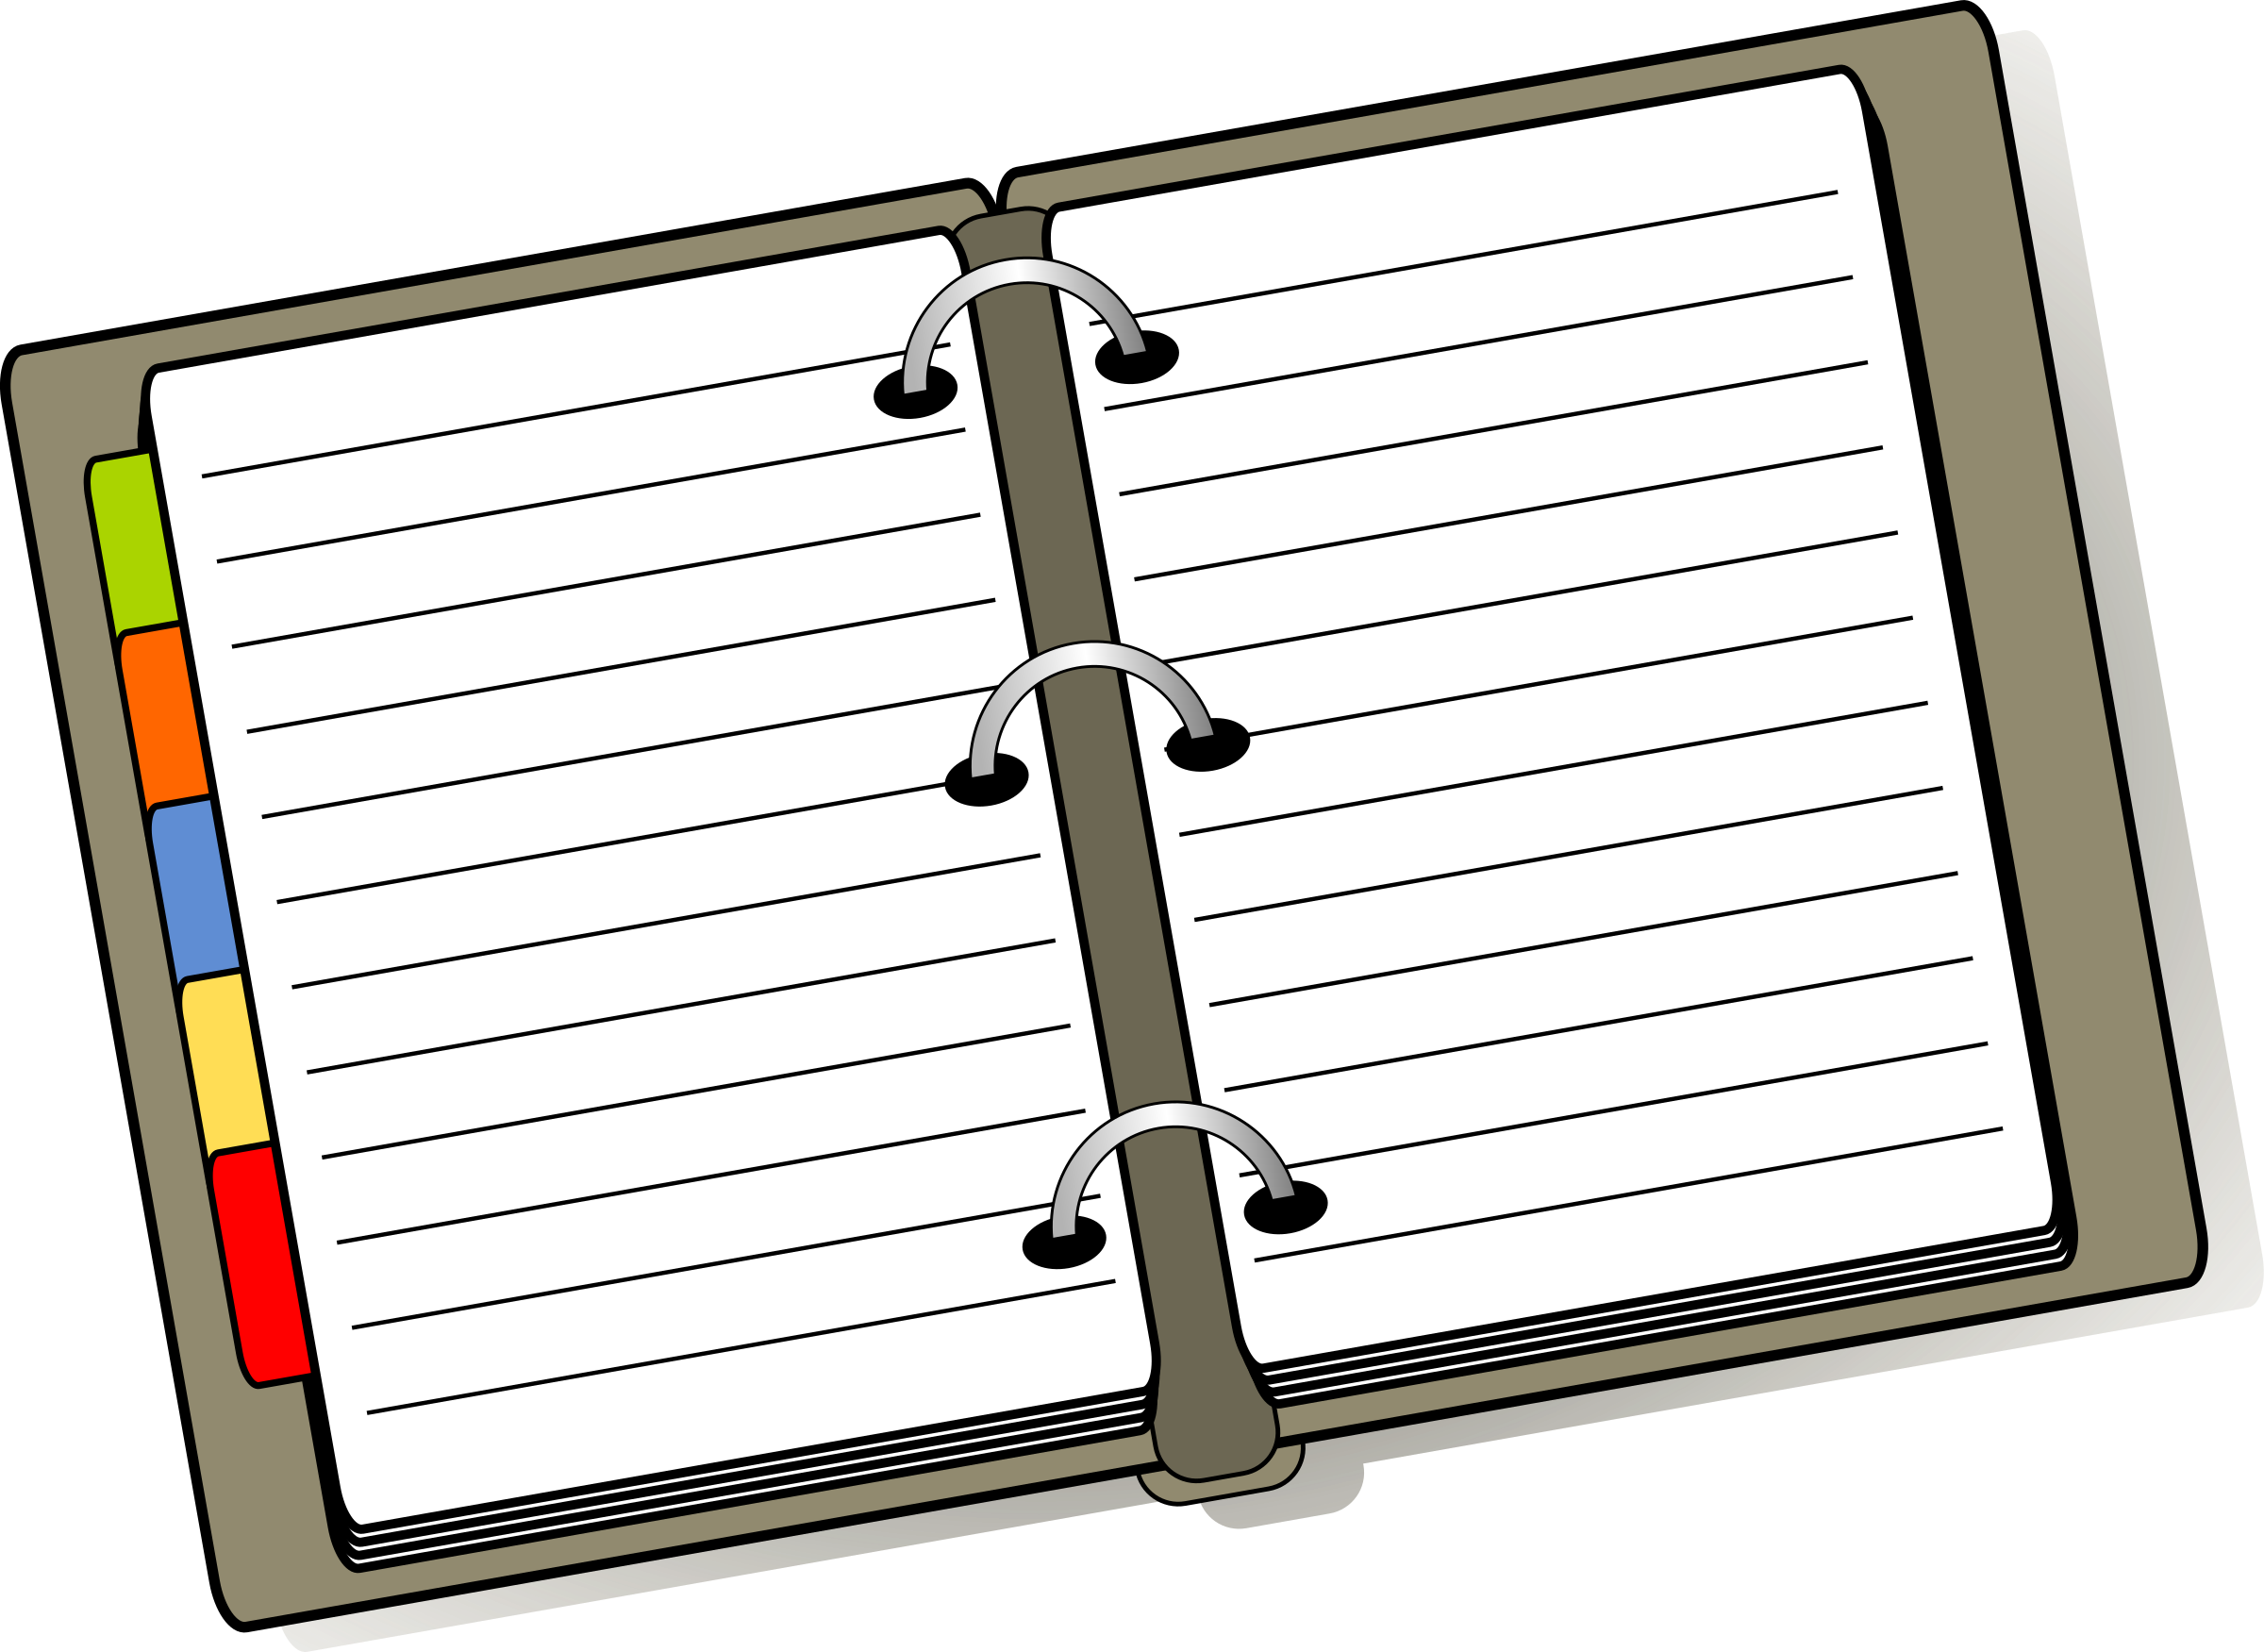 Planner clipart weekly planner, Planner weekly planner.